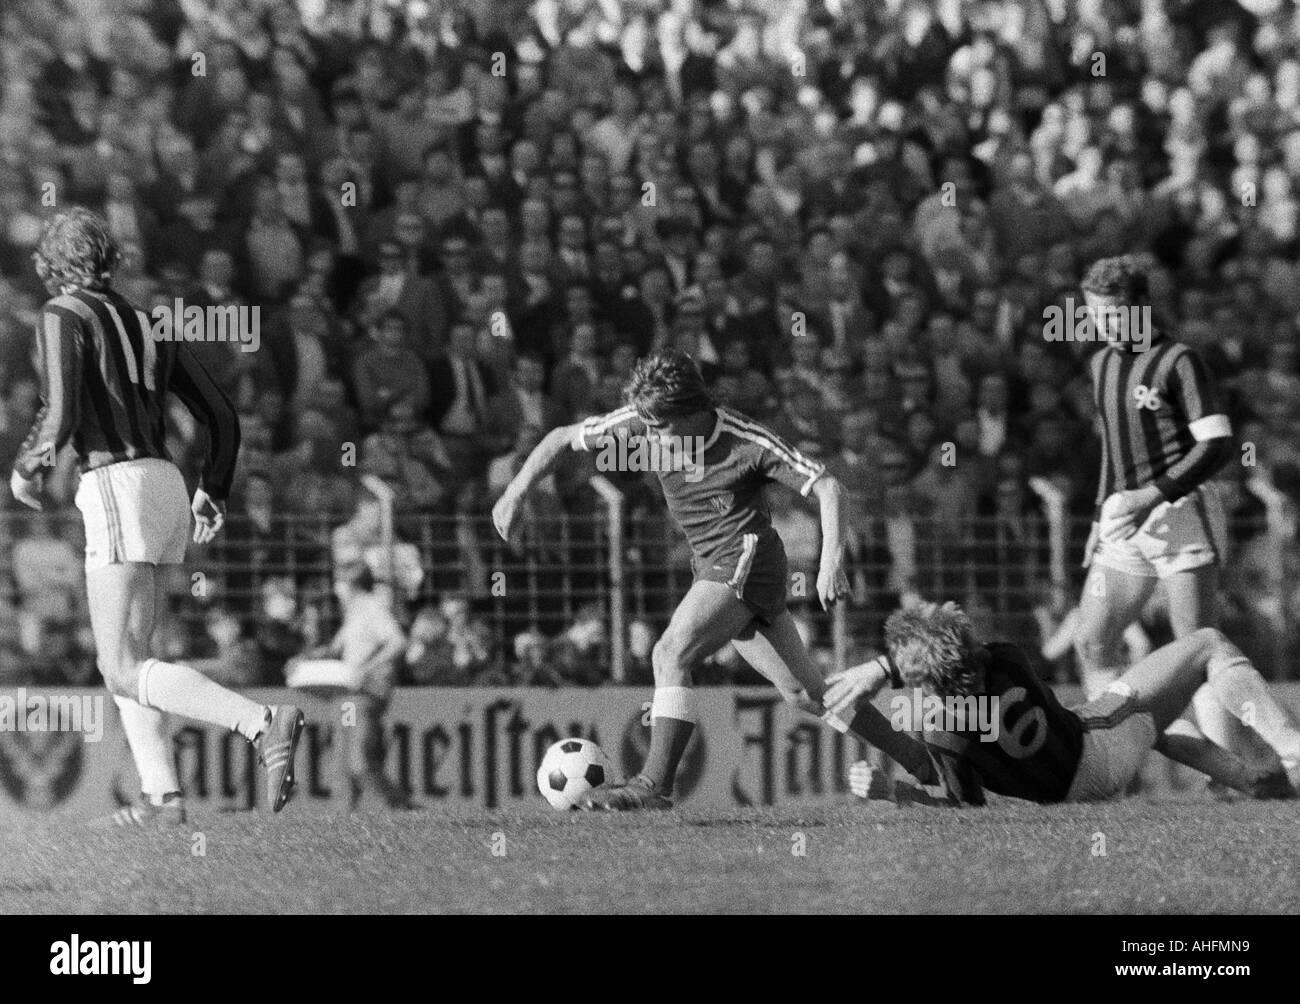 football, Bundesliga, 1971/1972, VfL Bochum versus Hanover 96 2:2, Stadium at the Castroper Strasse in Bochum, scene of the match, Hans Guenther Etterich (Bochum) in ball possession, right Hans Siemensmeyer (96) - Stock Image